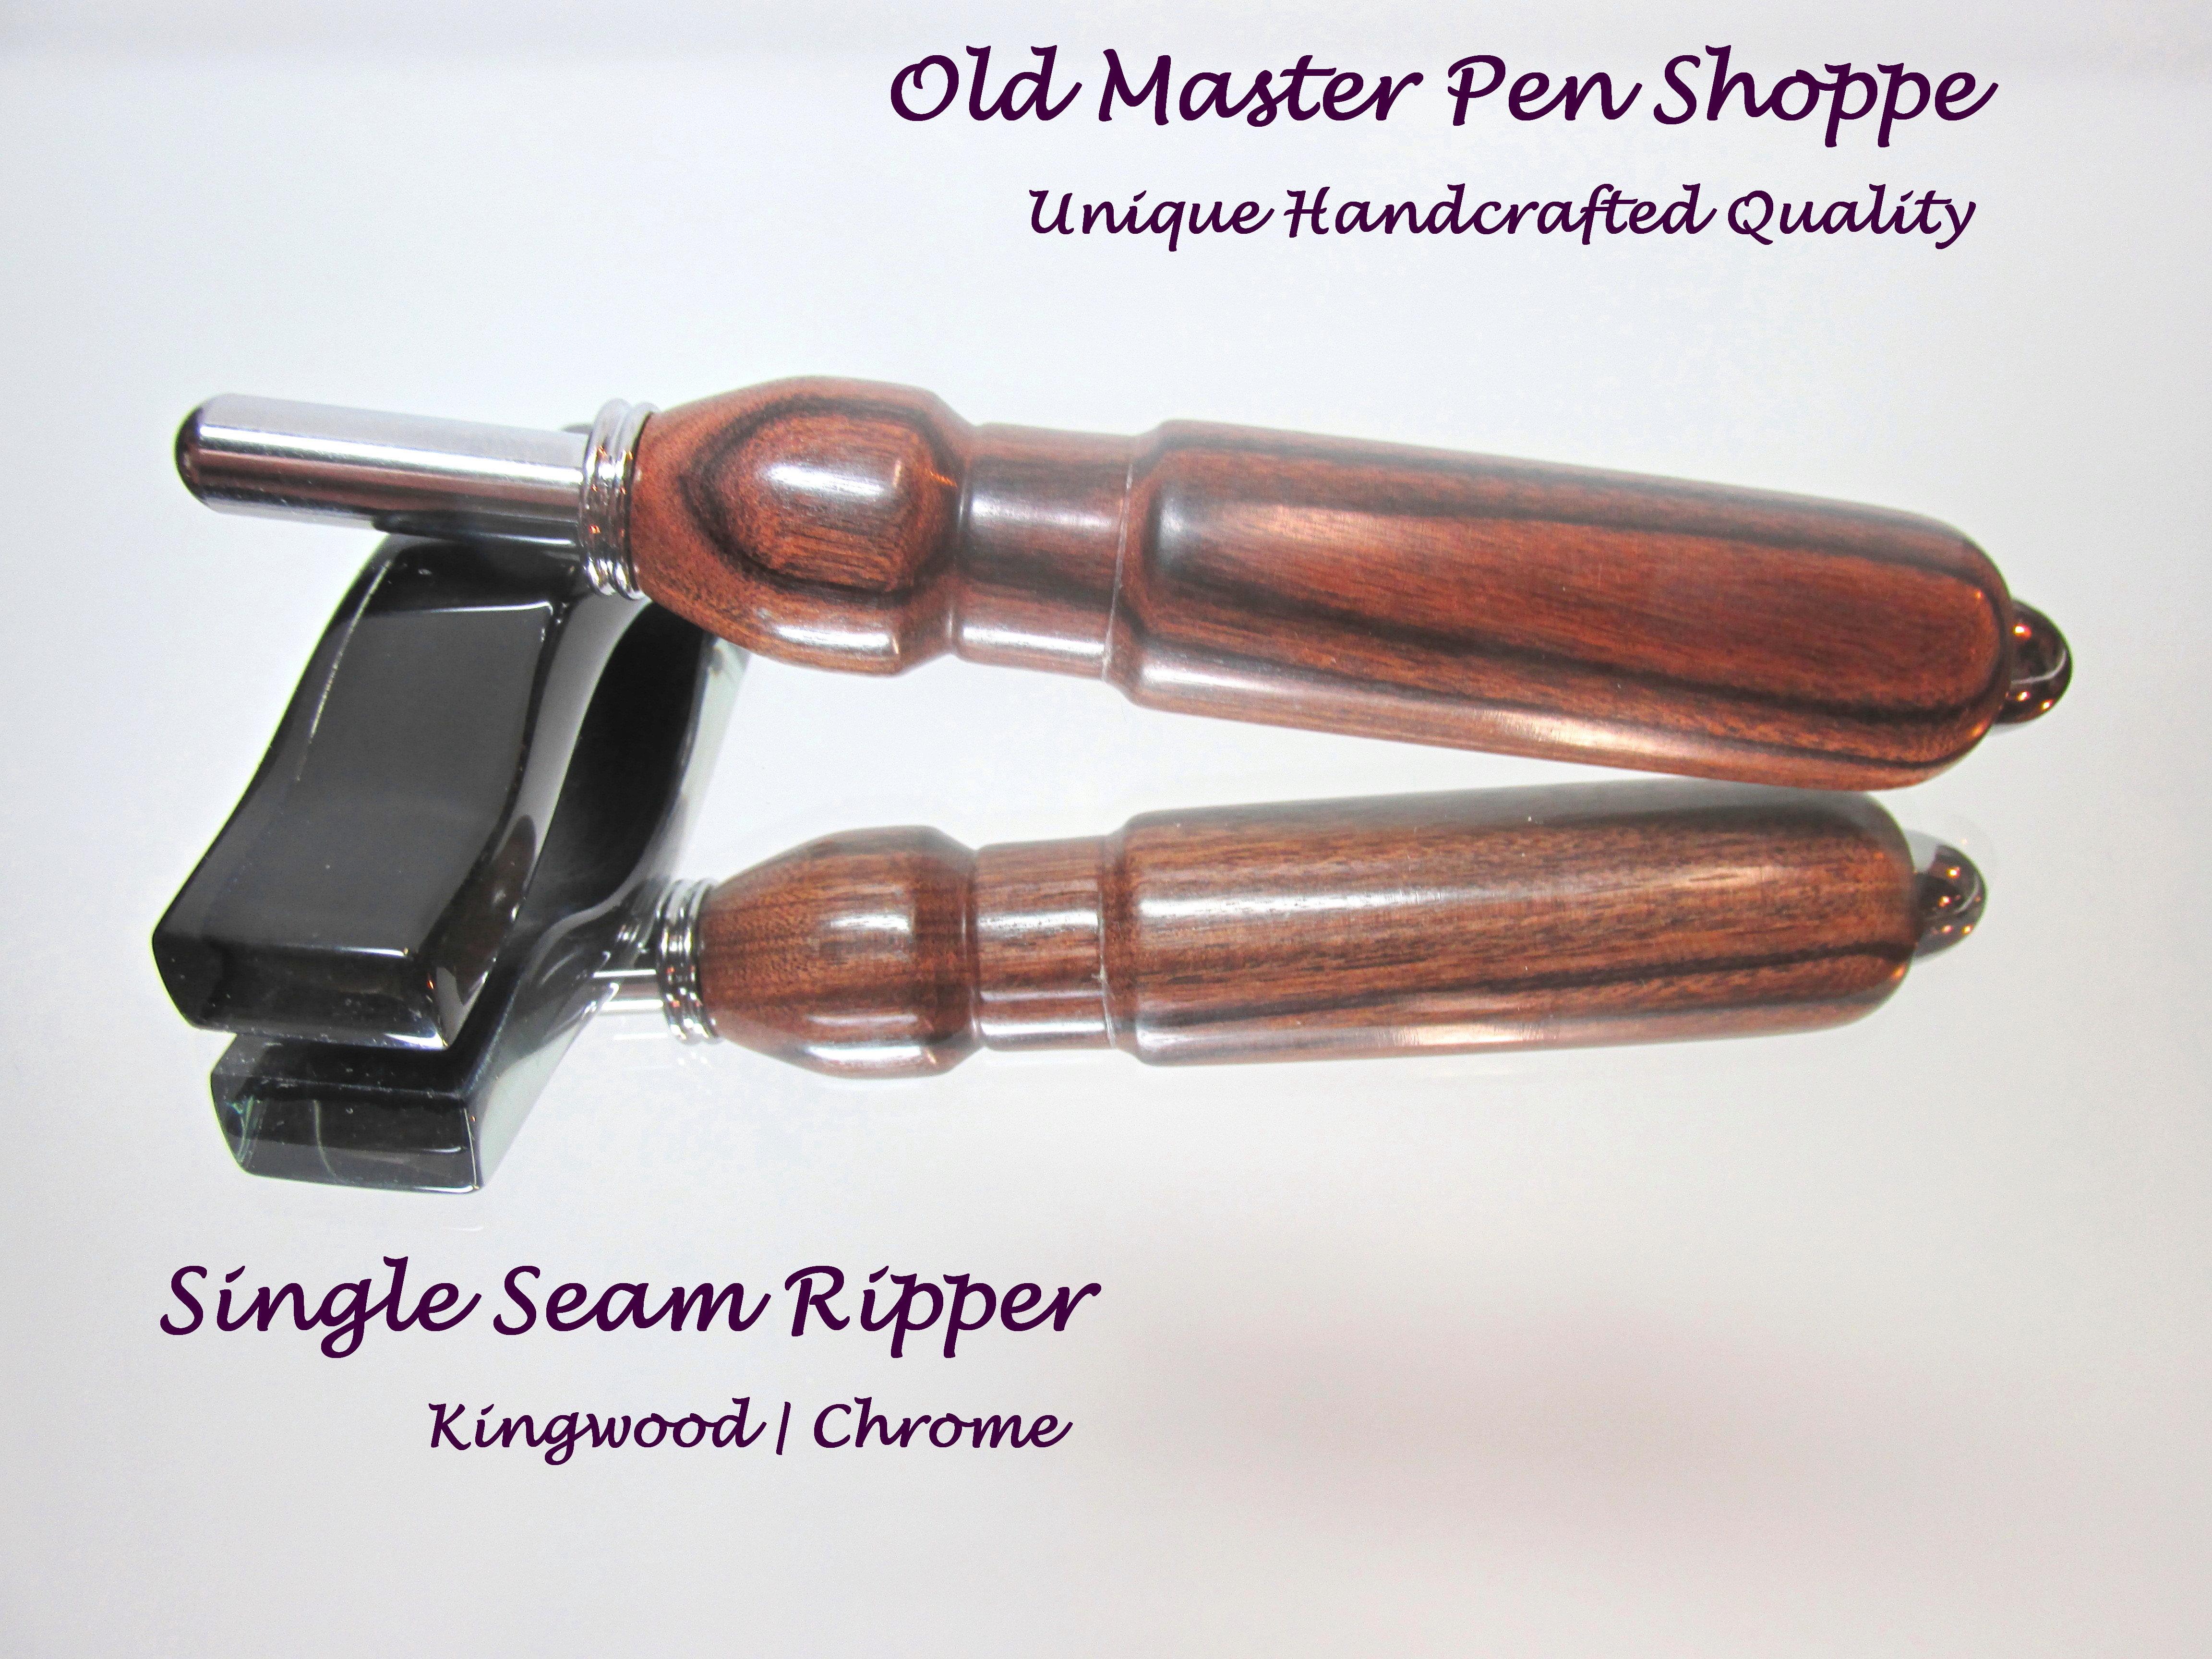 Handmade Kingwood Seam Ripper or Stiletto with Chrome Plating